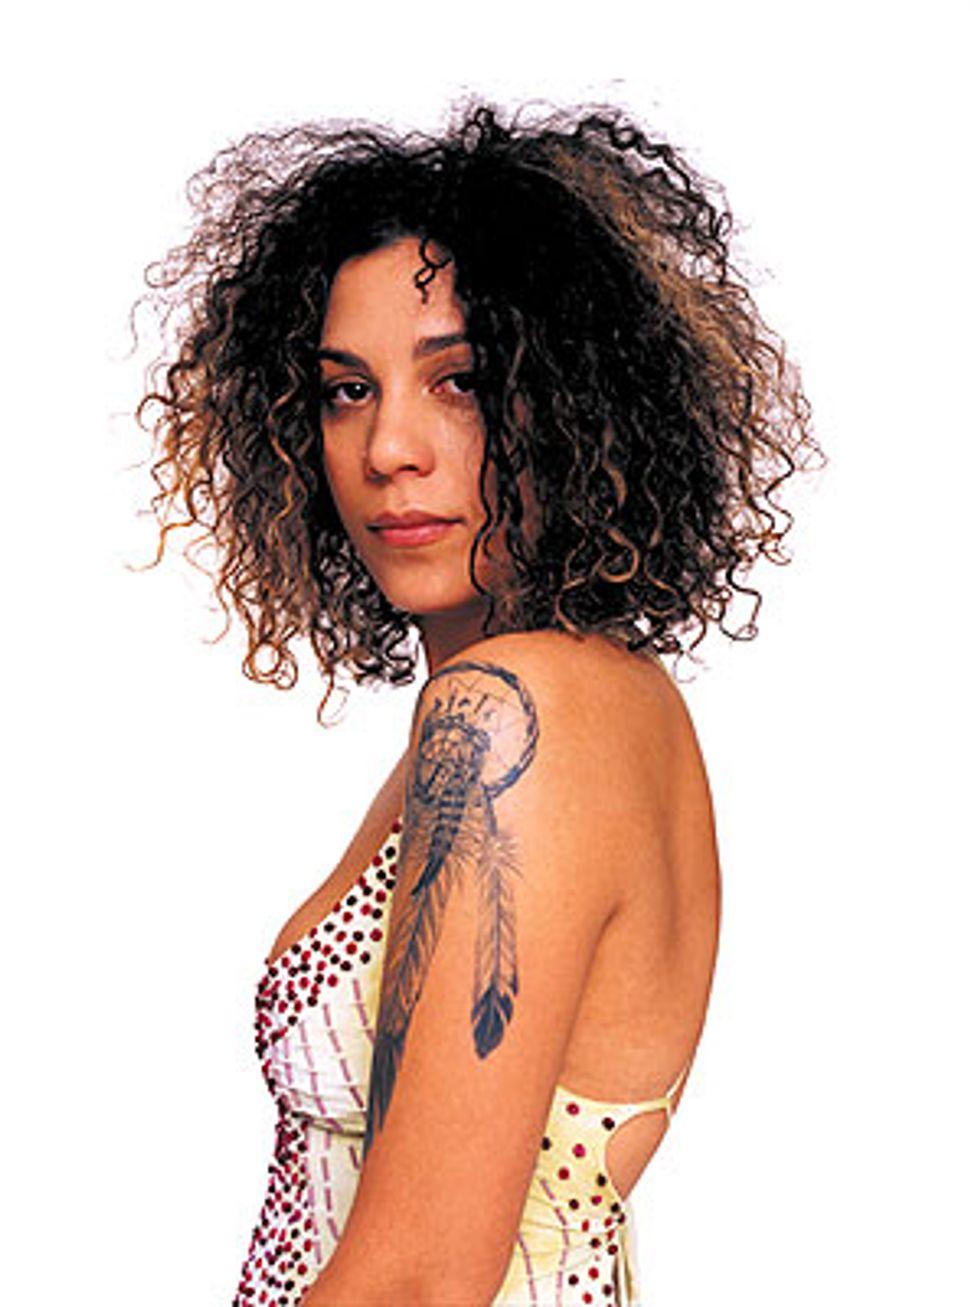 Beautiful People 2003: Raquel Cepeda